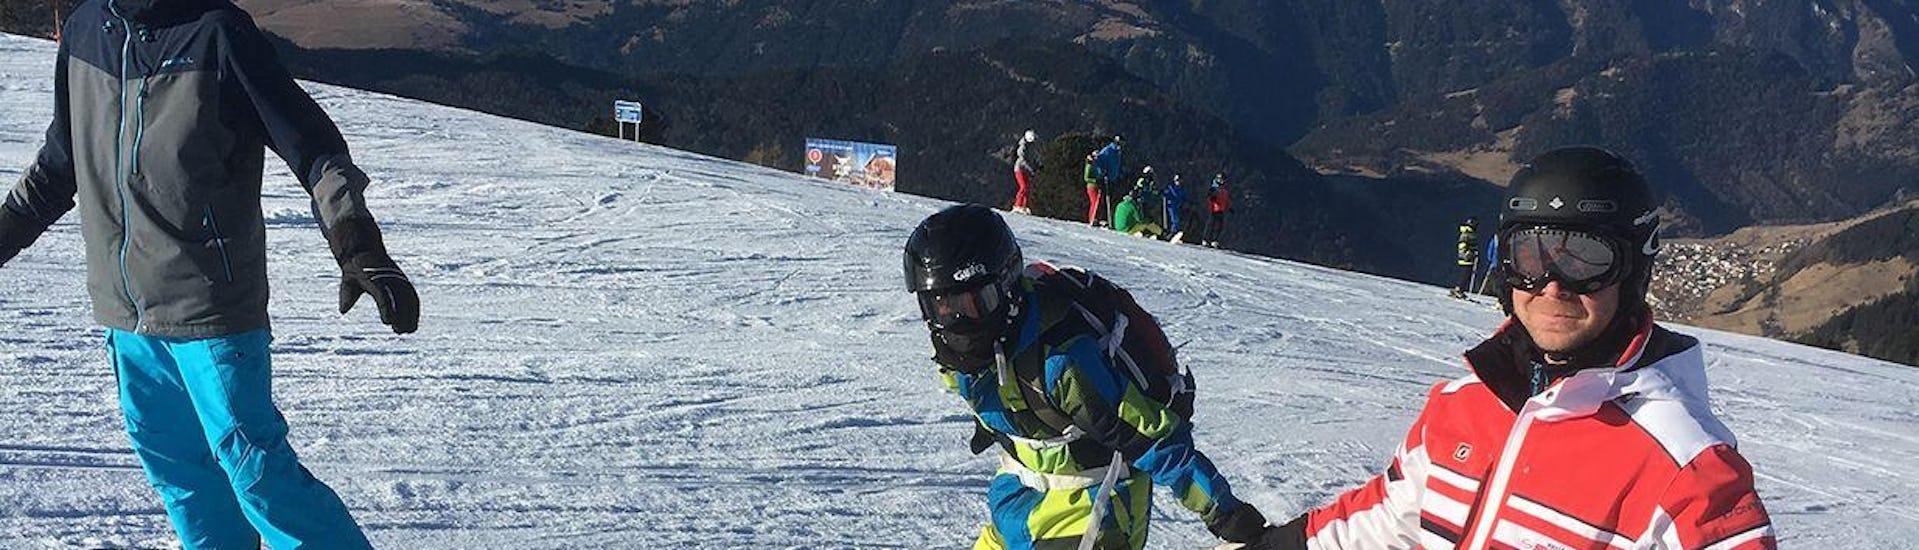 Snowboard Instructor Private in Samnaun/Ischgl